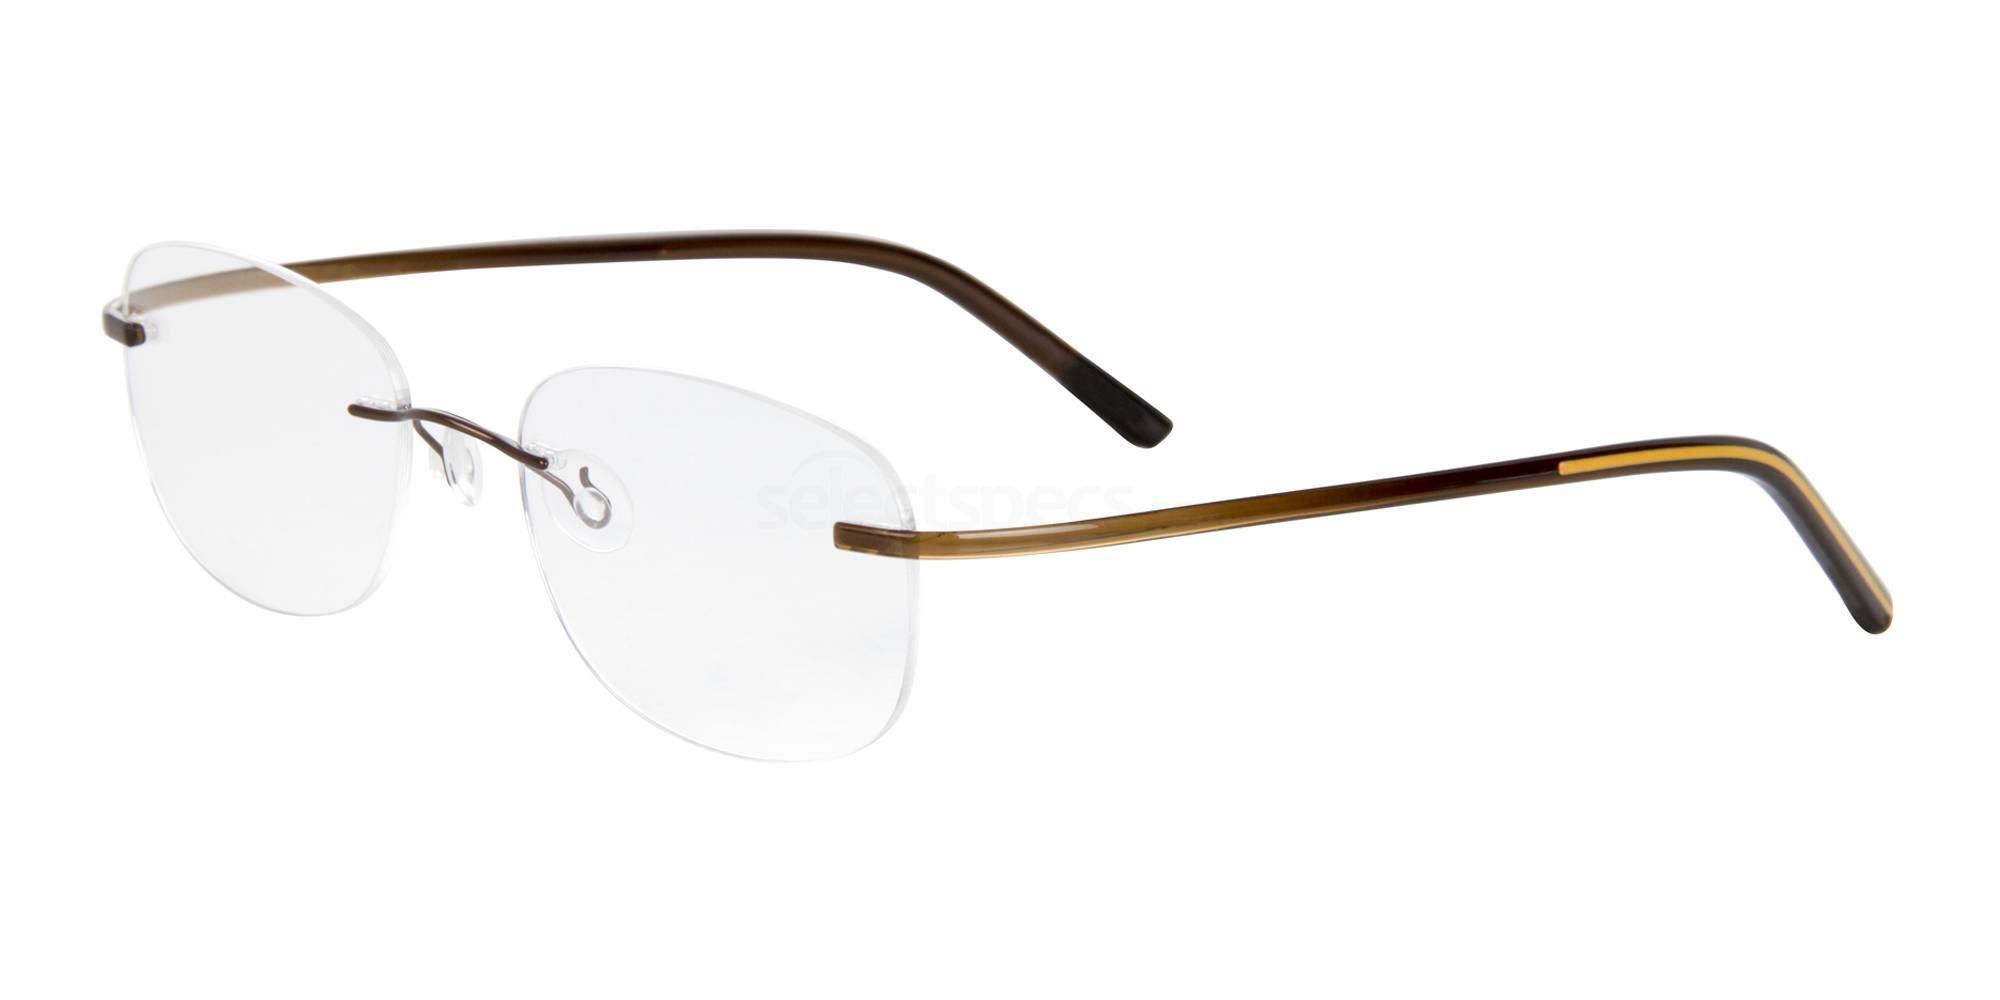 210 ENERGY 201 Glasses, AIRLOCK